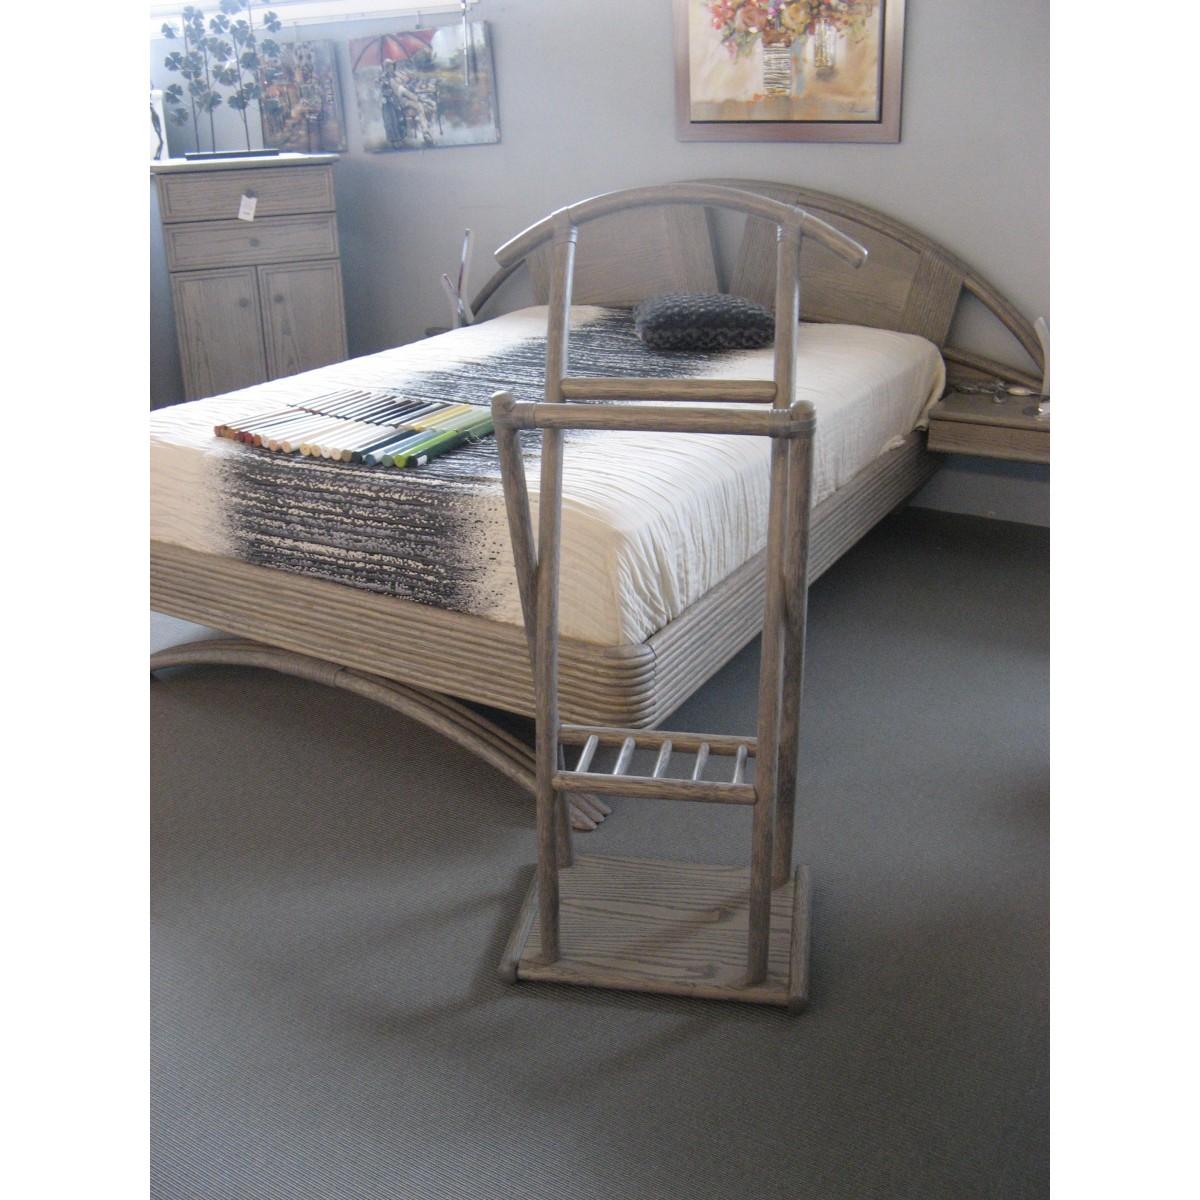 valet de chambre blanc chambre valet de chambre ikea. Black Bedroom Furniture Sets. Home Design Ideas